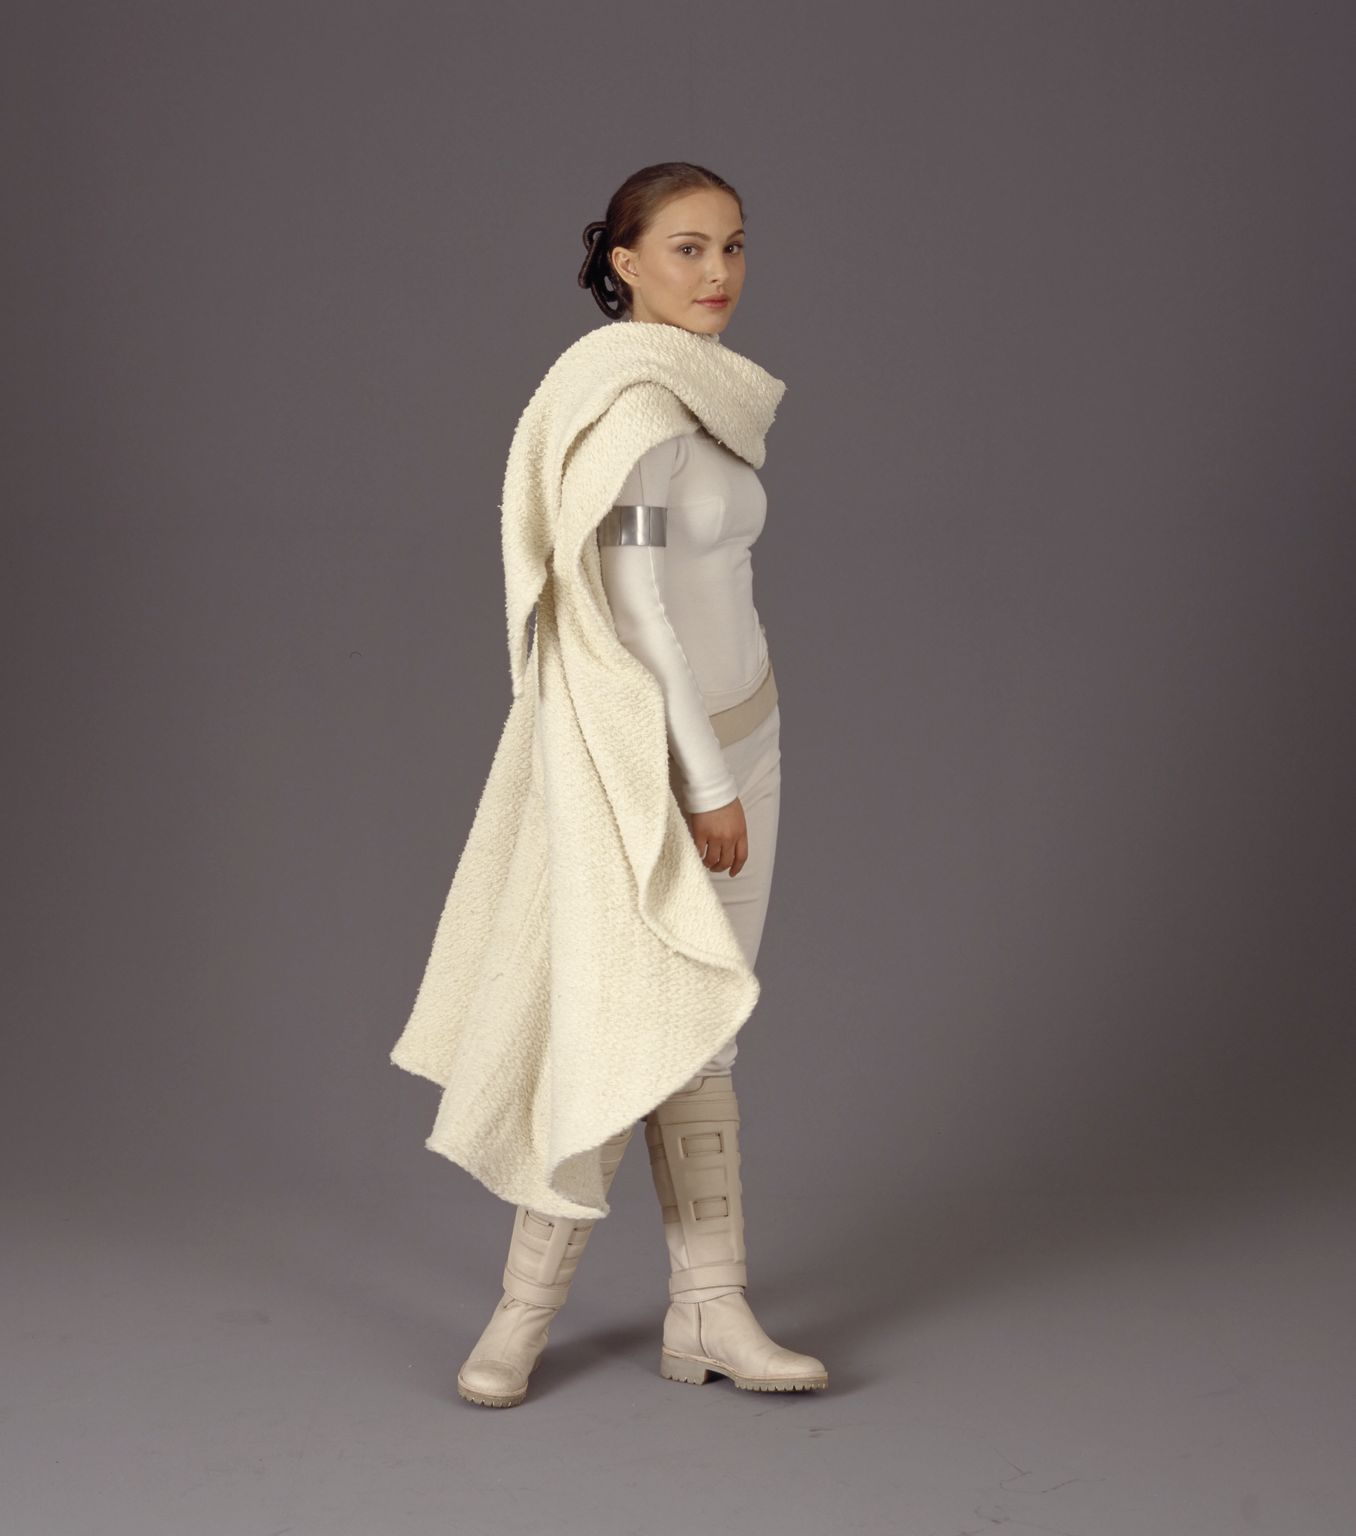 Natalie portman as padme amidala in star wars prequels - Princesse amidala star wars ...